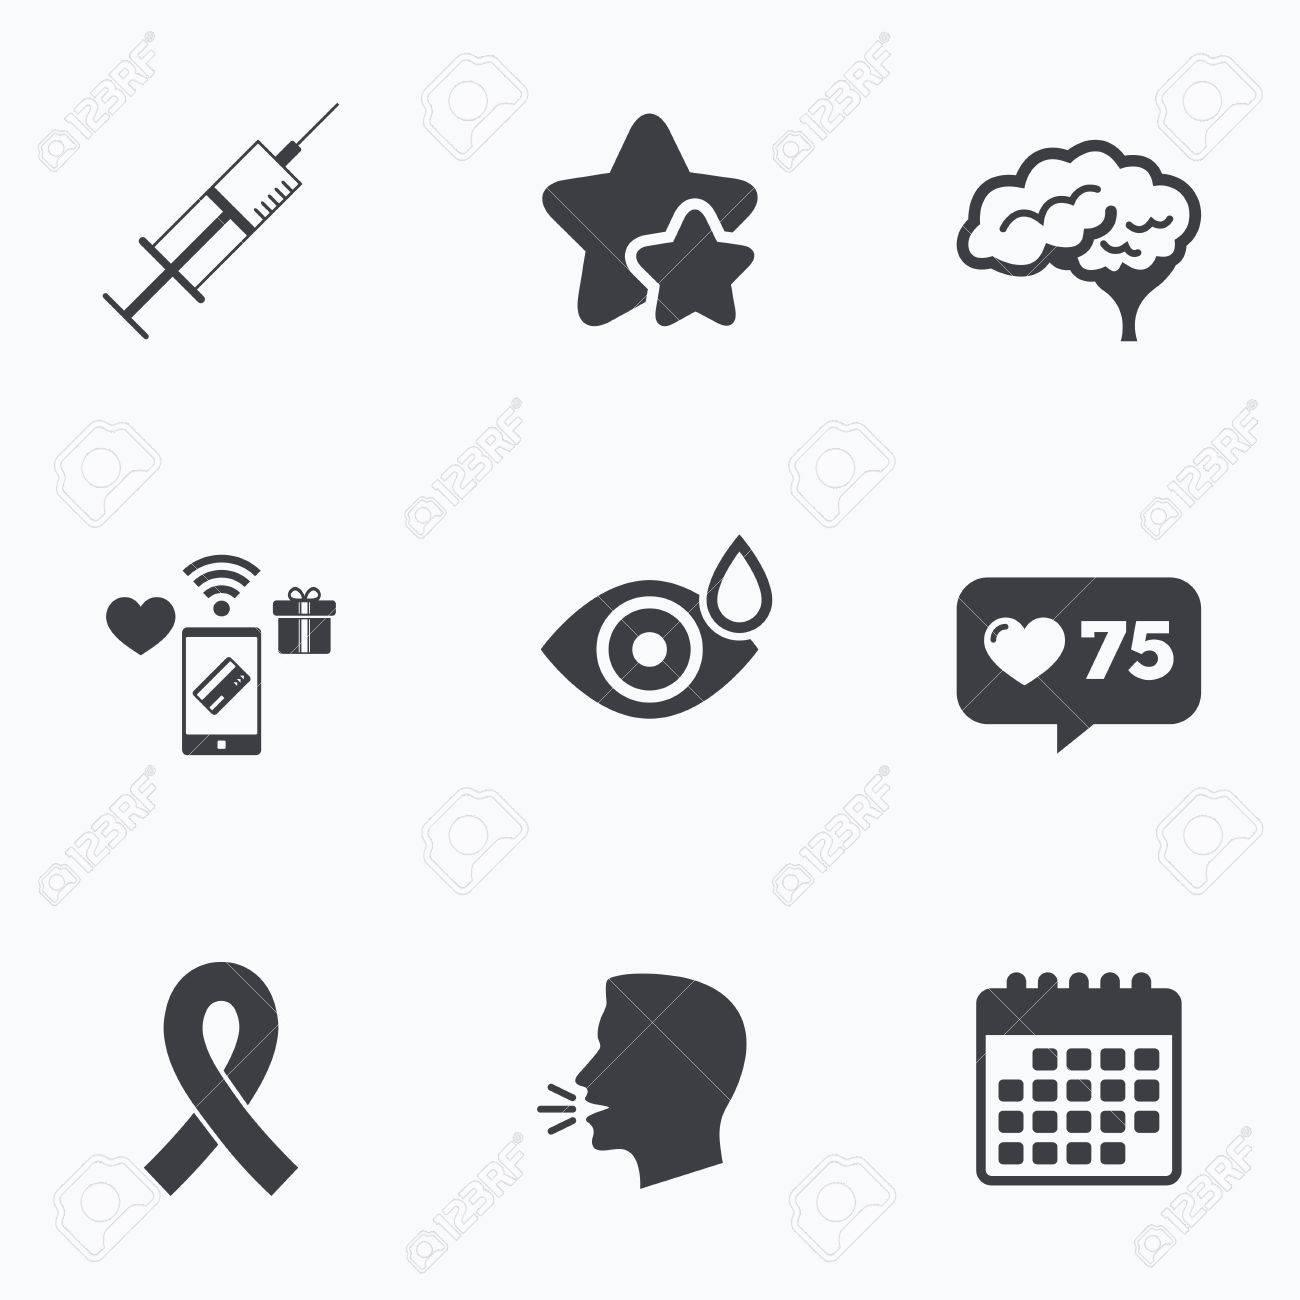 Cancer Brain symbol new photo